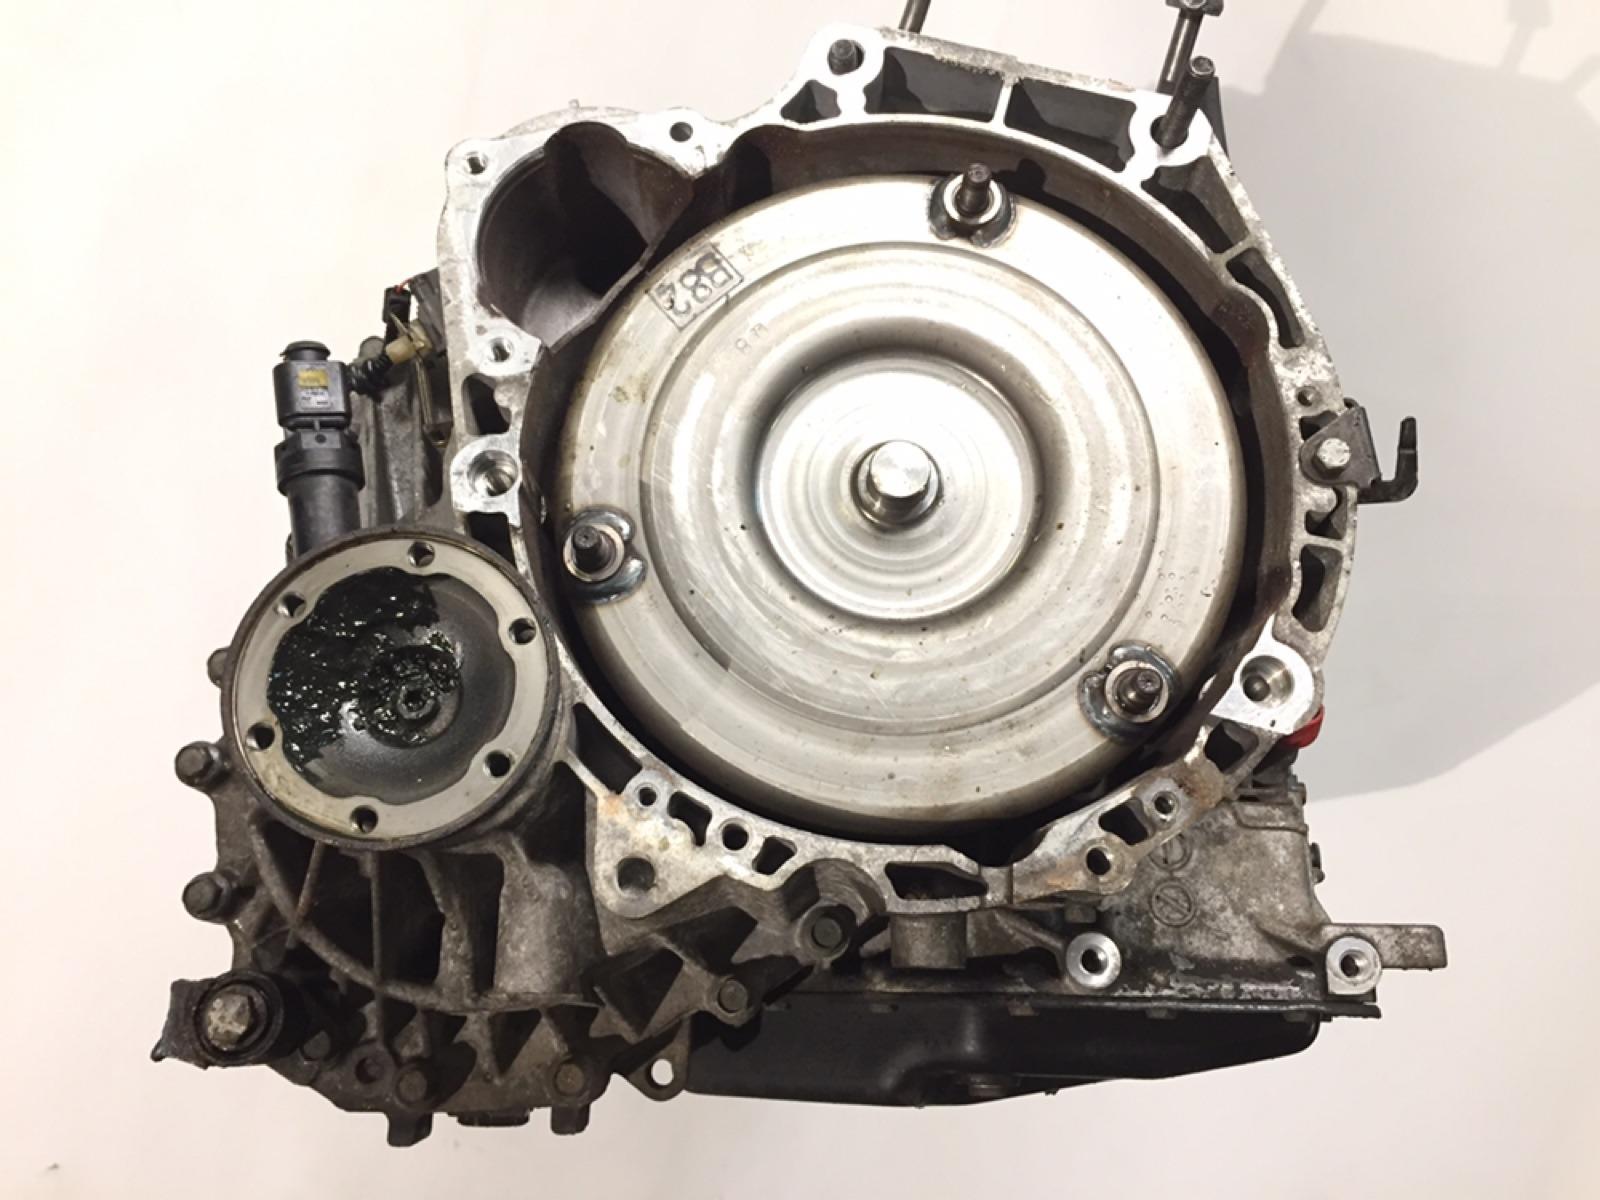 Кпп автоматическая (акпп) Volkswagen Lupo 1.4 I 2002 (б/у)